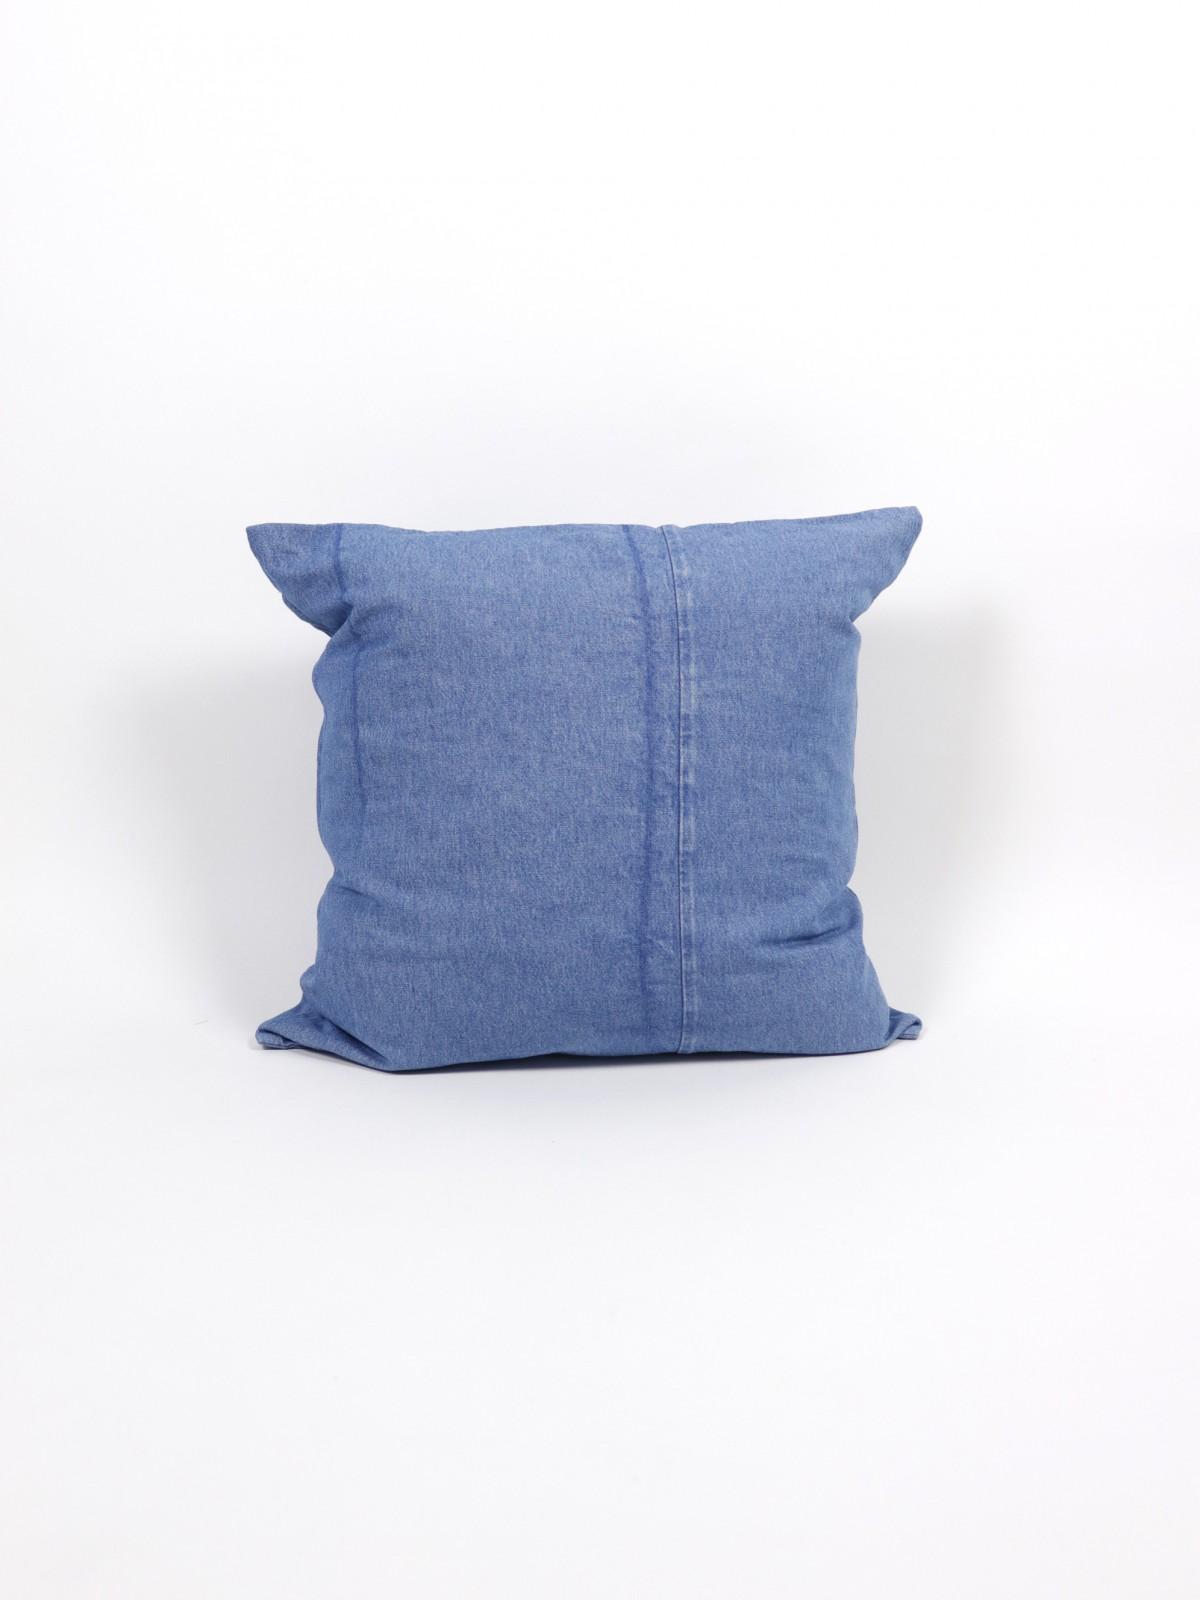 Ralph lauren,denim,BROWN.remake,cushion,USA